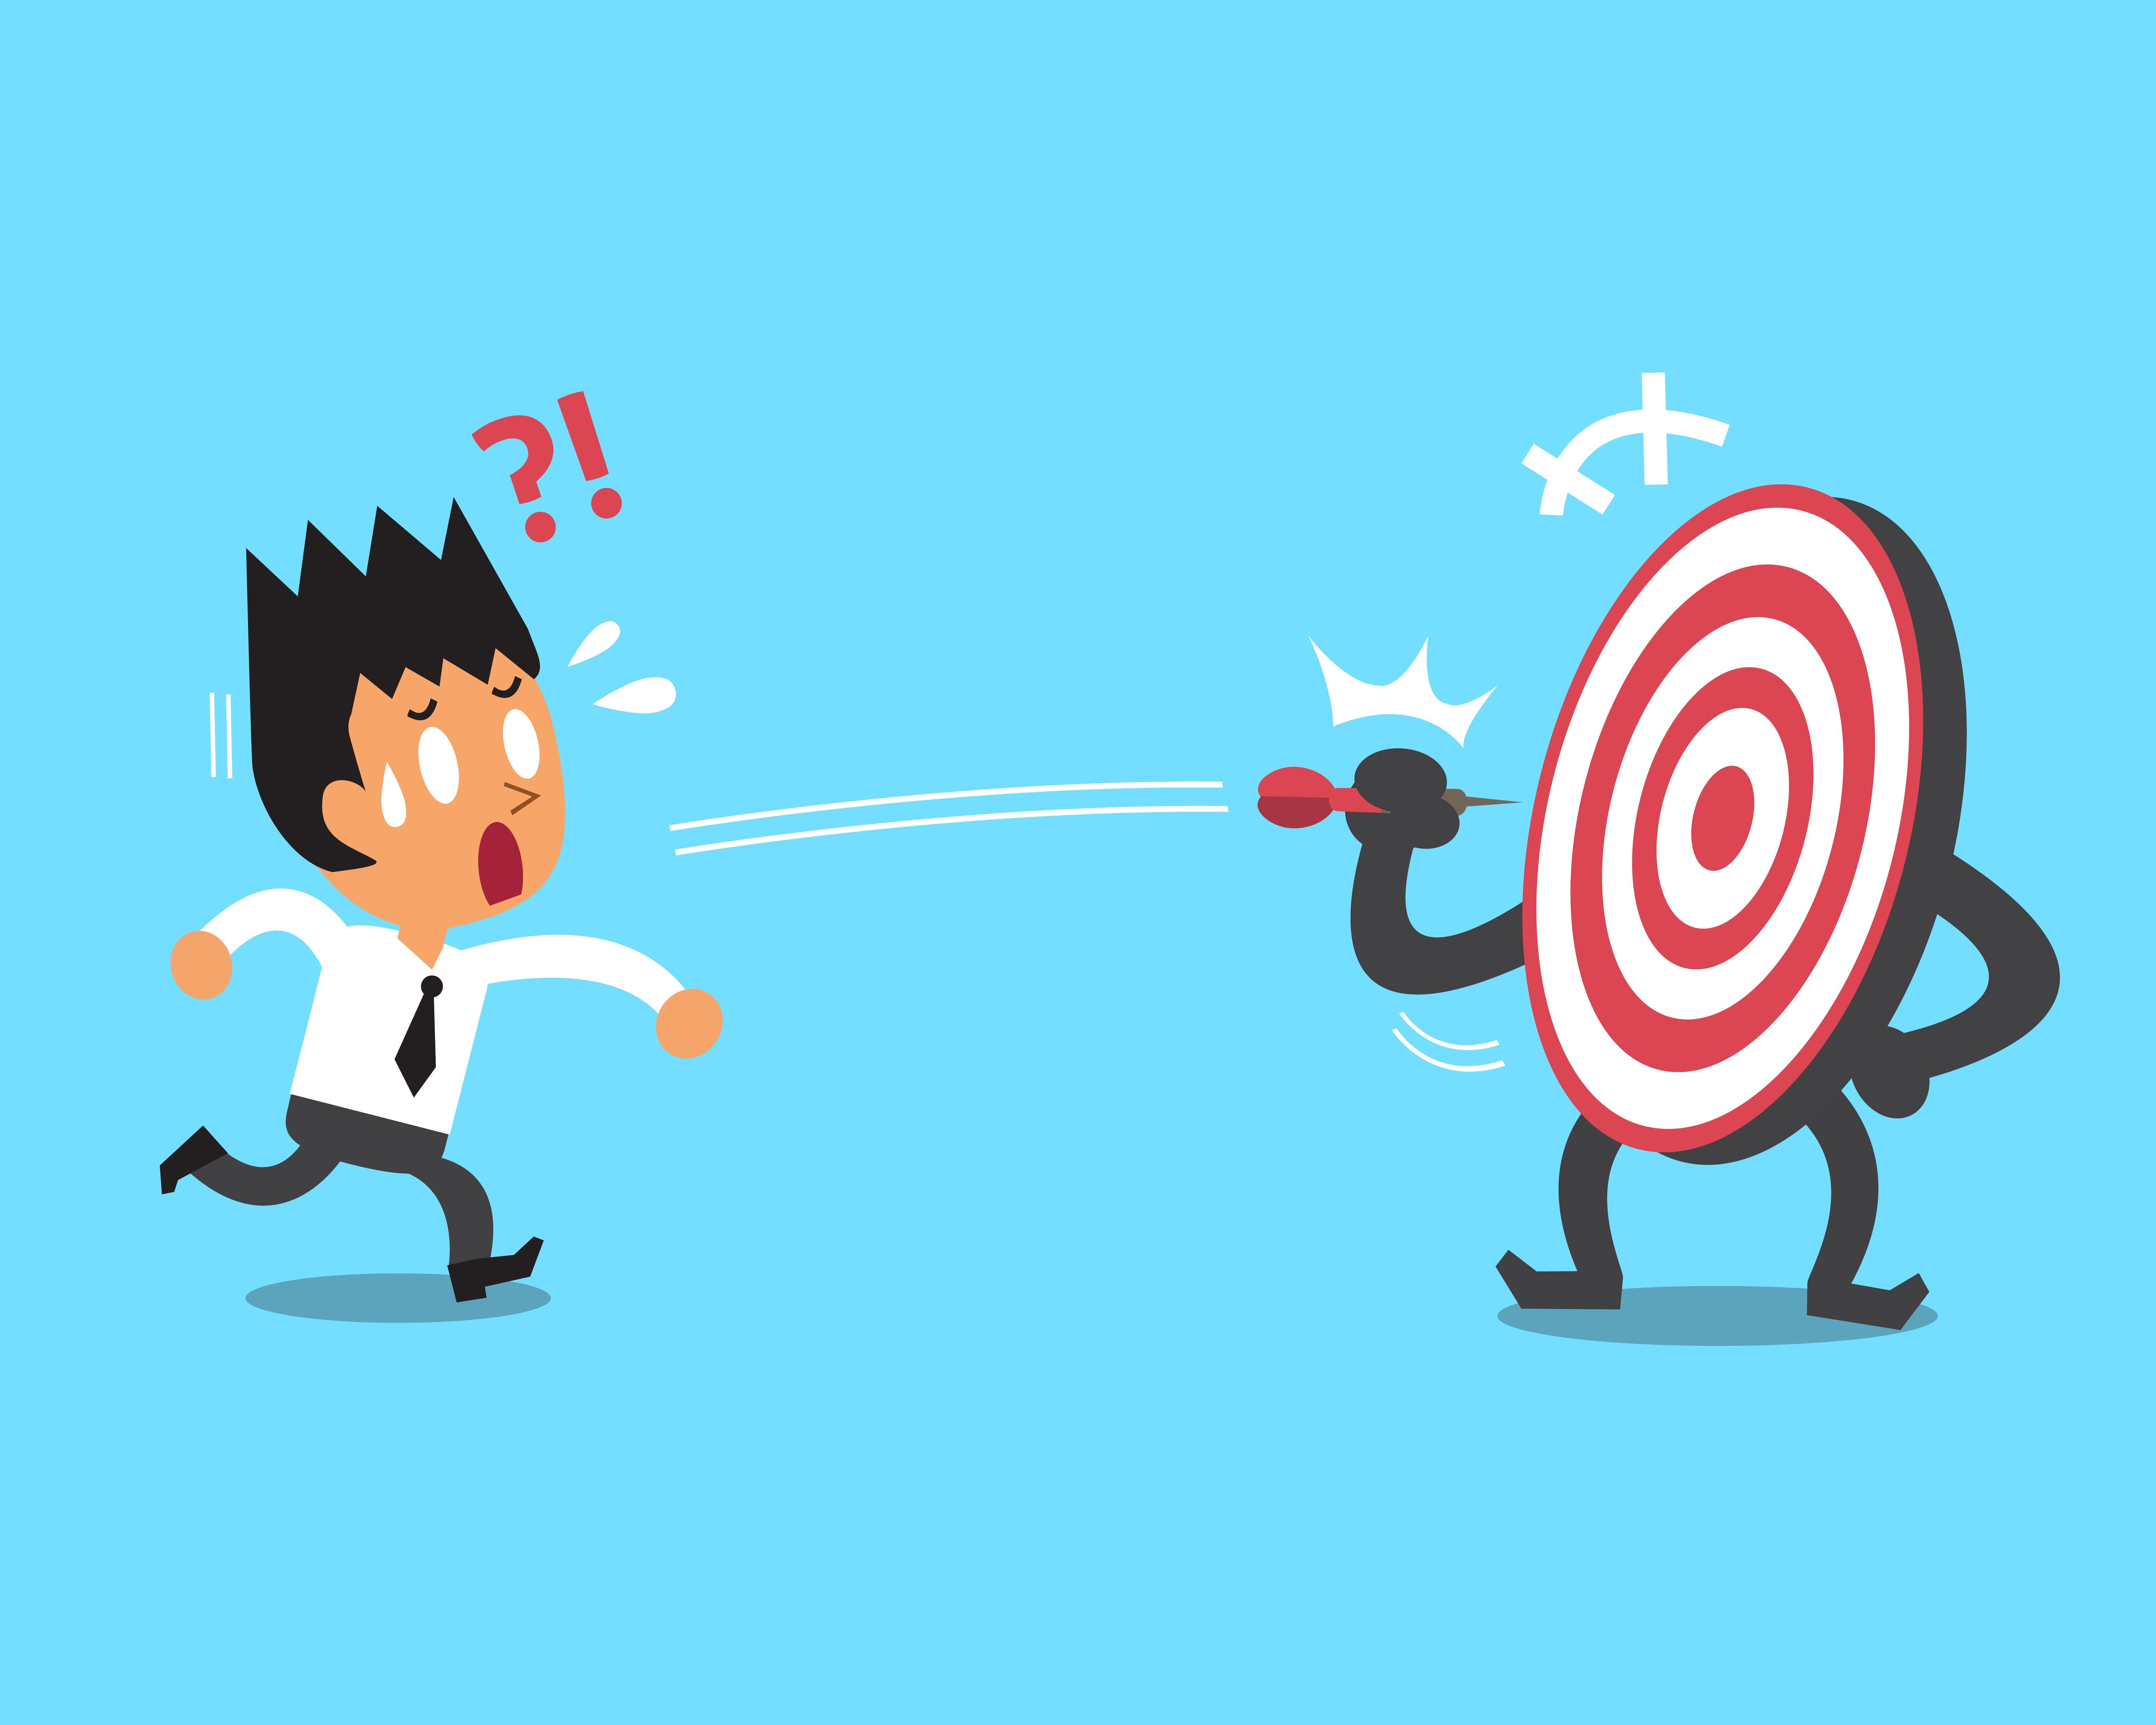 target-employee-benefits-principles.jpg